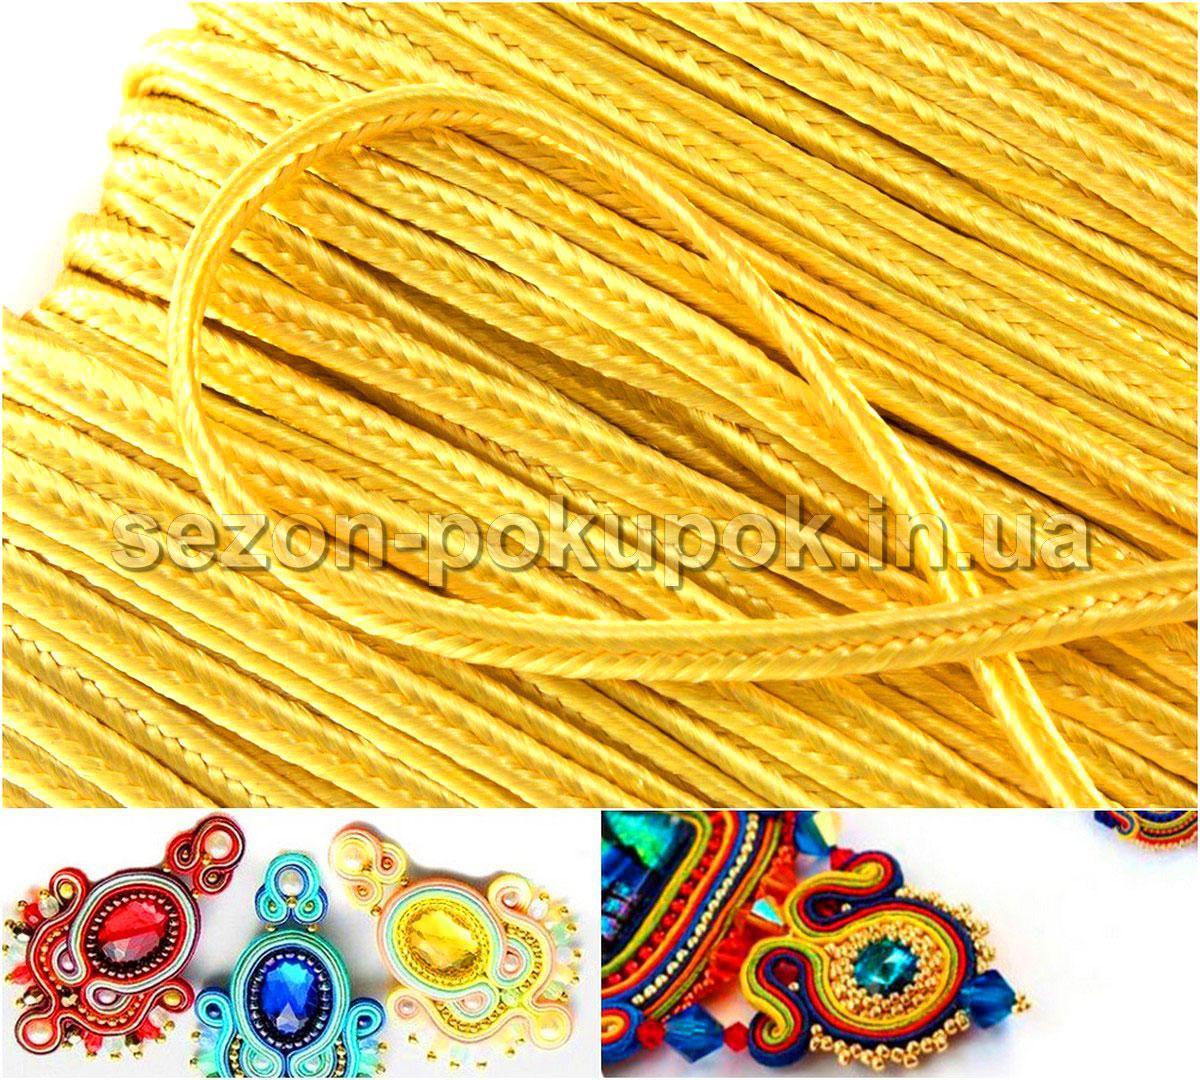 (38-40 метров) Сутажный шнур, сутаж  (ширина 3мм) Цена указана за упаковку Цвет - Желтый